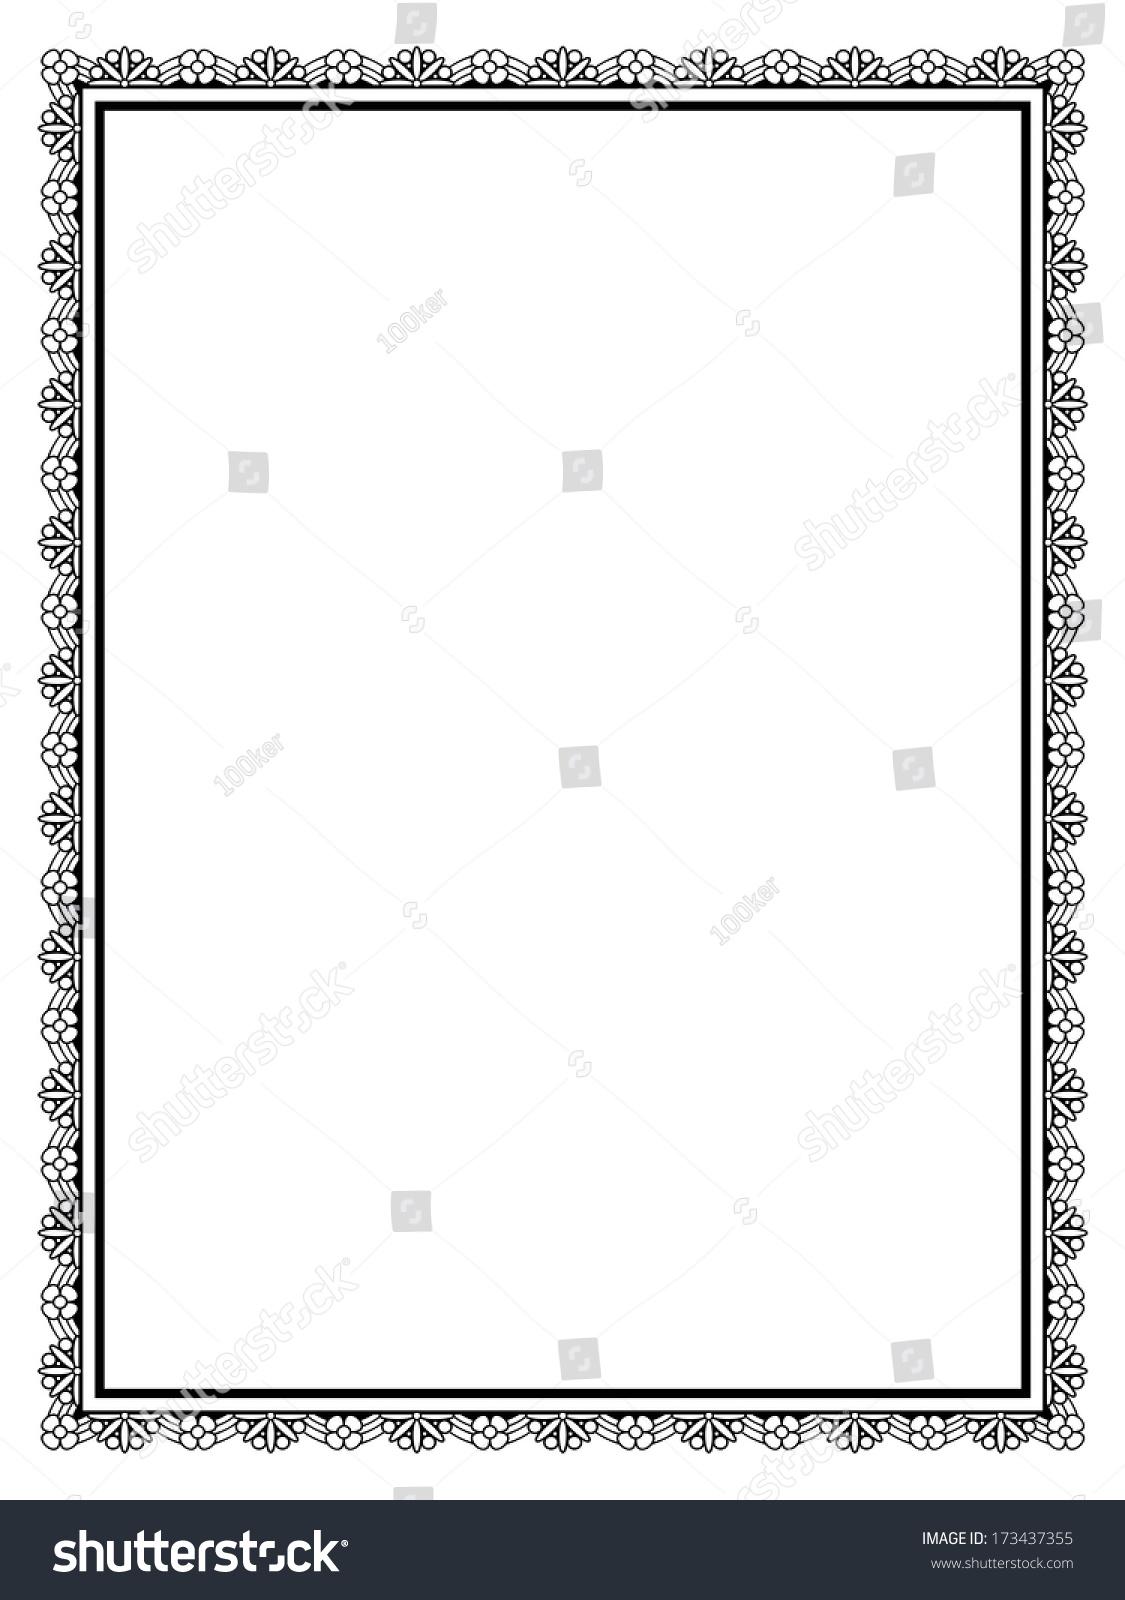 ppt 背景 背景图片 边框 模板 设计 相框 1125_1600 竖版 竖屏